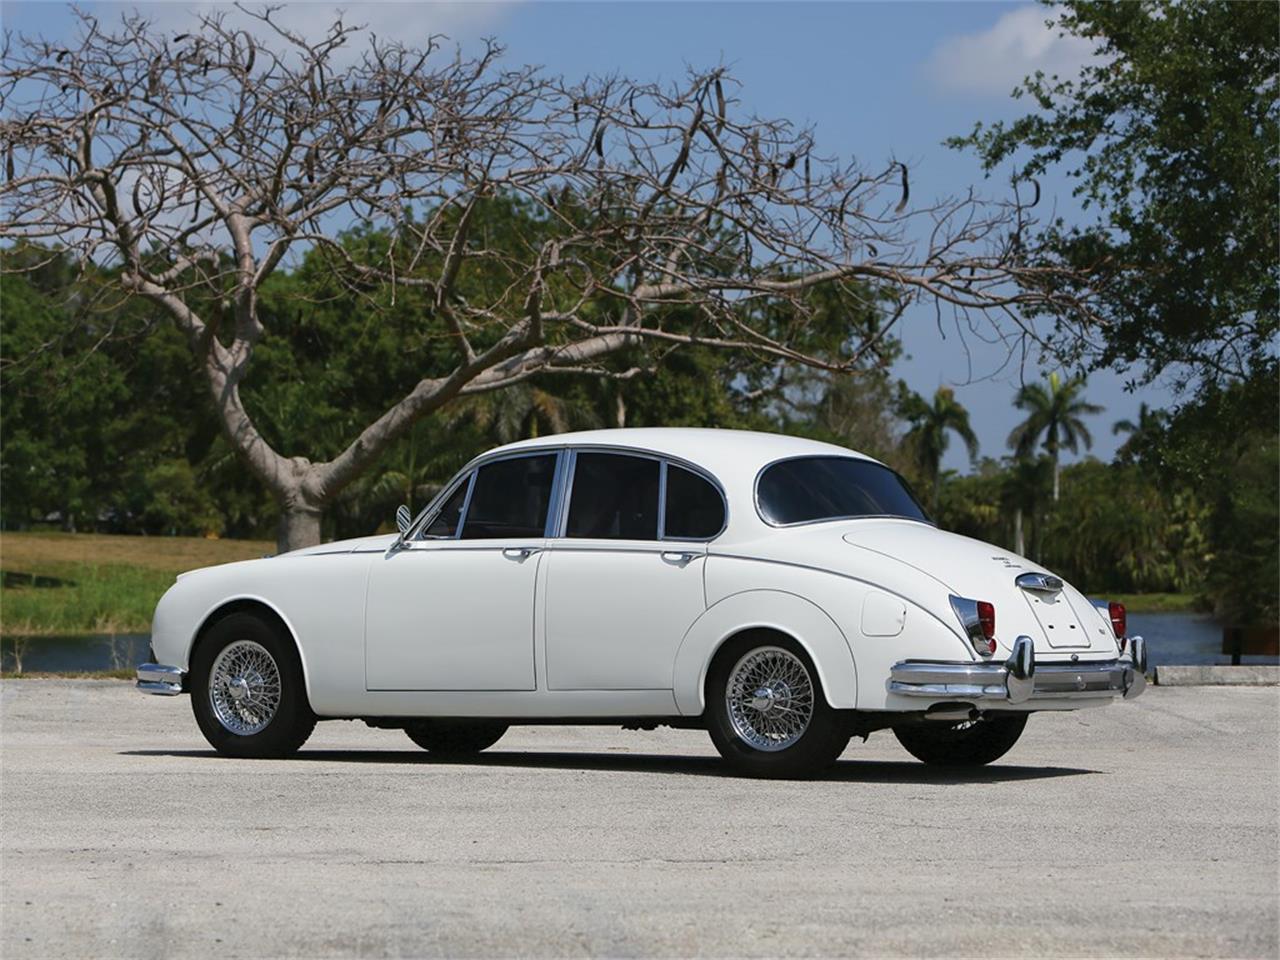 1962 Jaguar Mark 2 3.8 Saloon for Sale | ClassicCars.com | CC-1078532